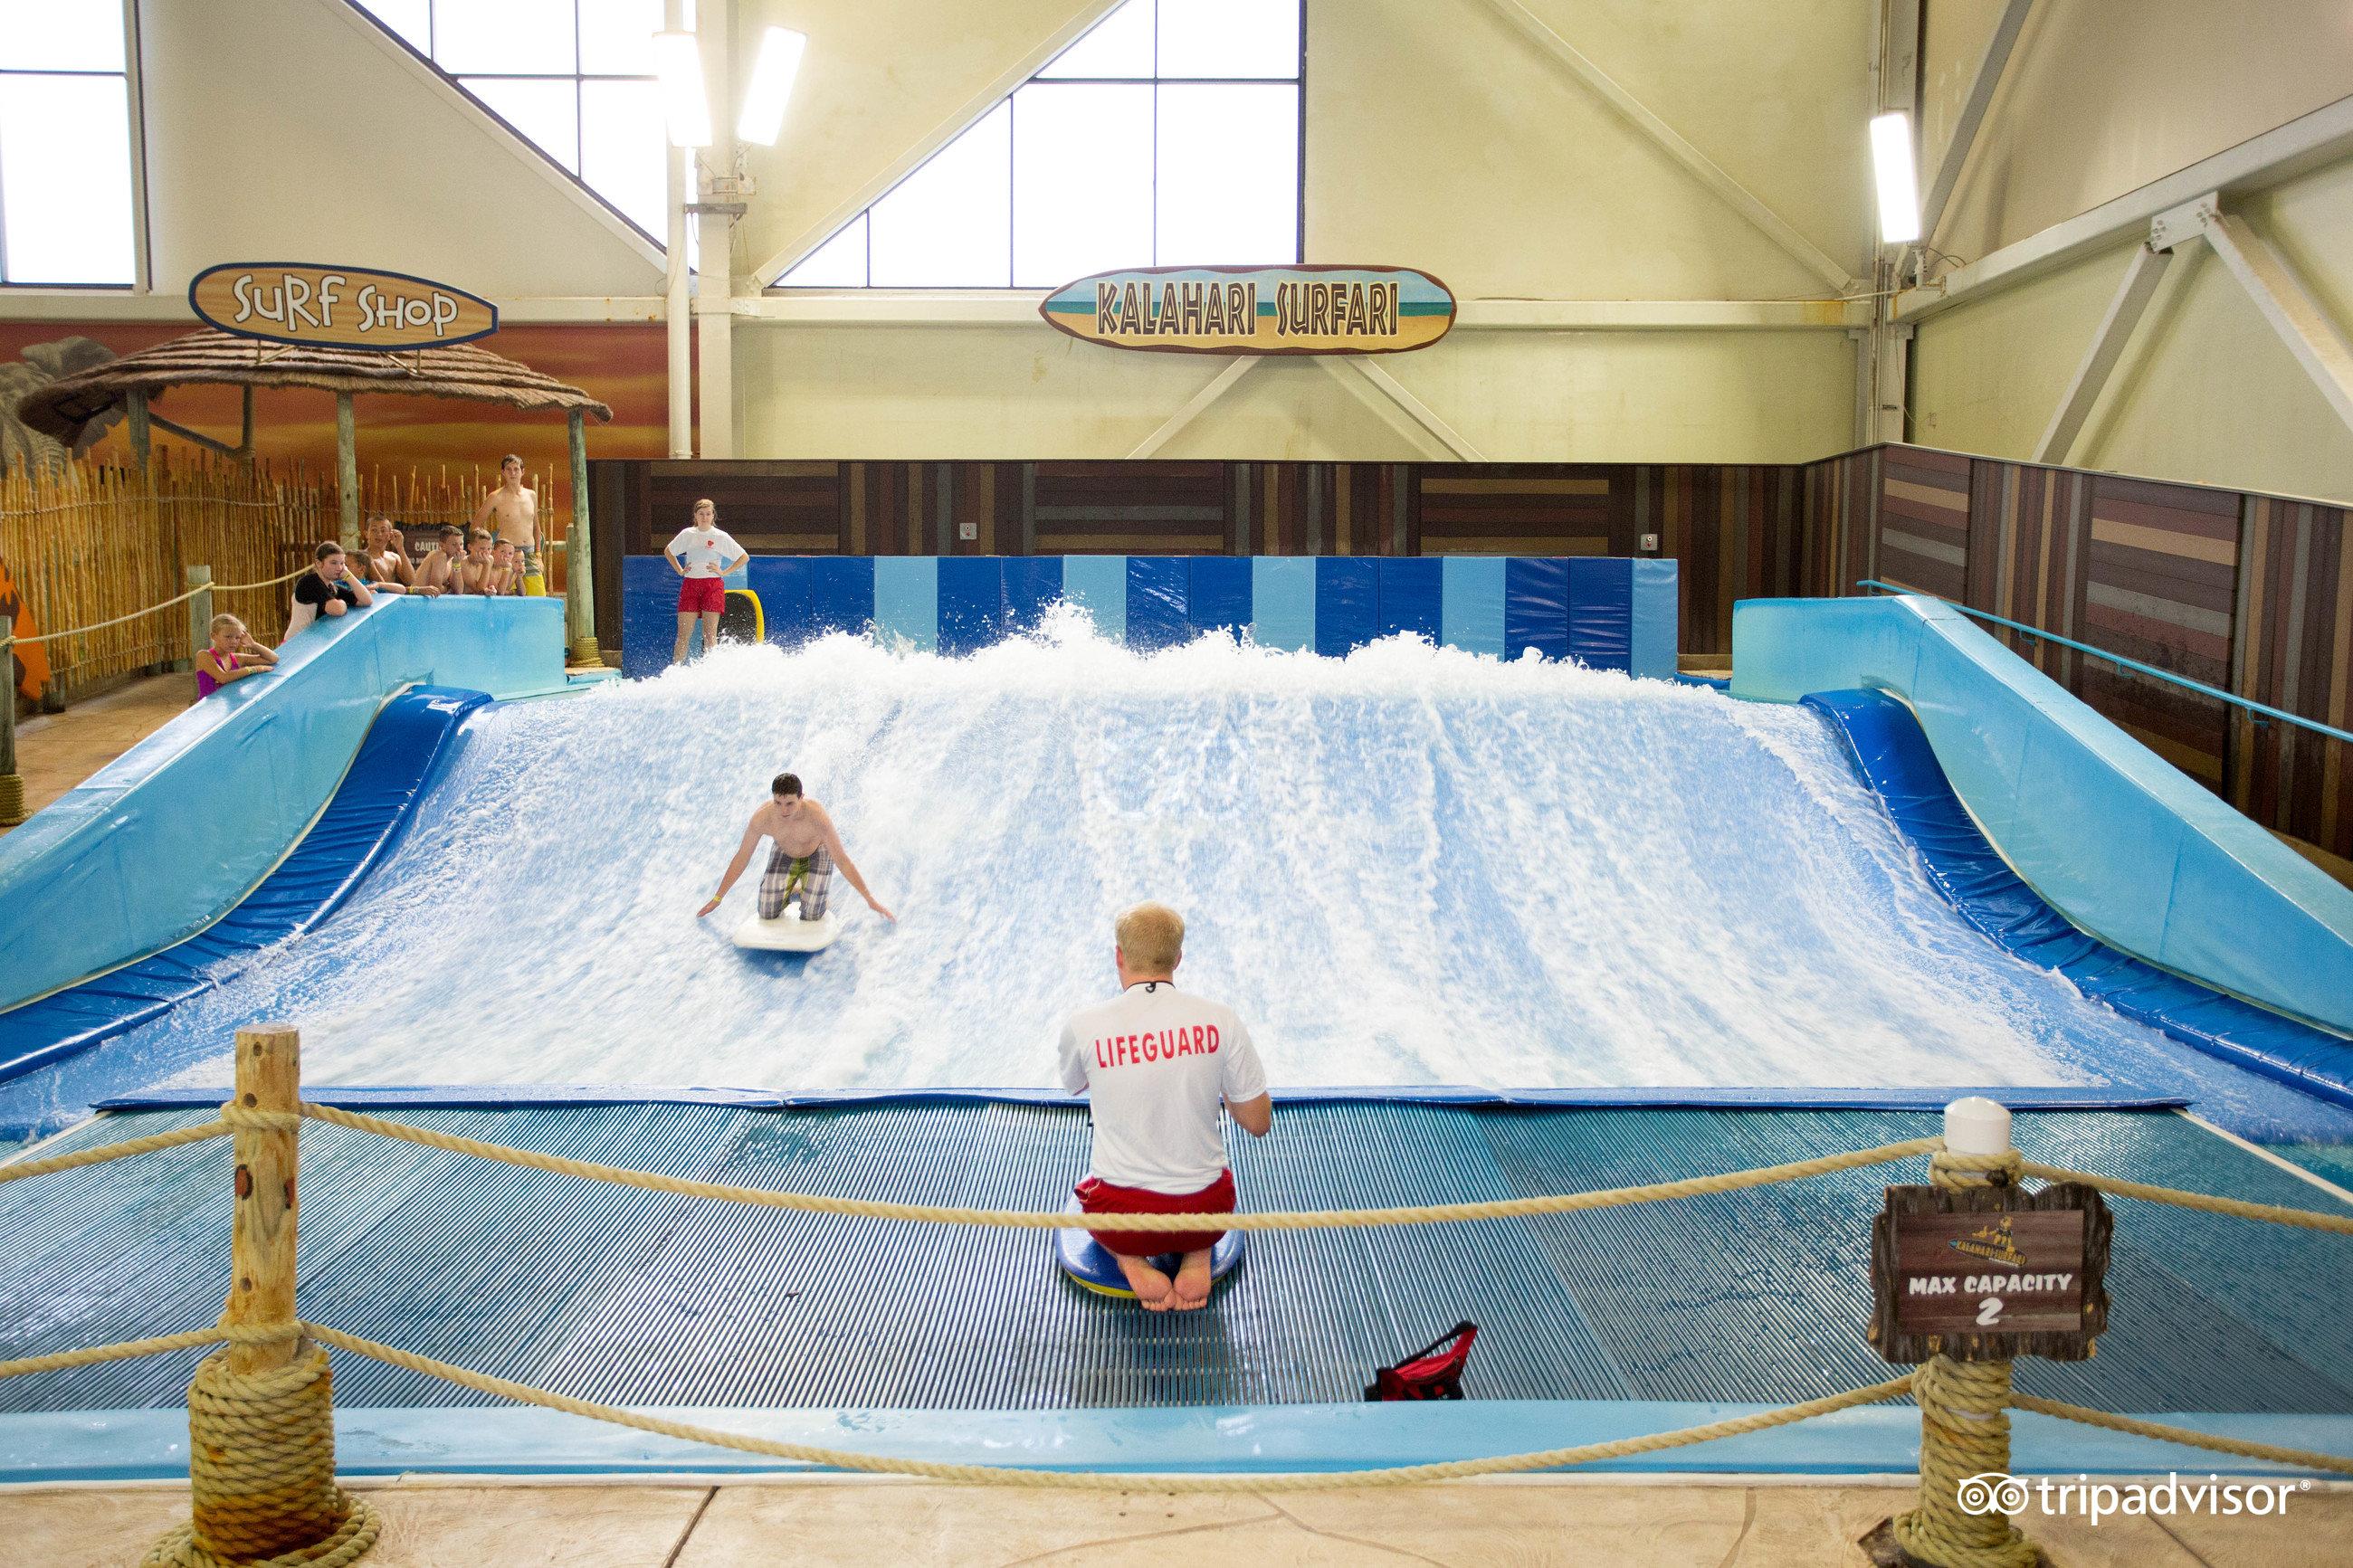 Mt. Olympus Water & Theme Park - Wisconsin Dells - TripAdvisor